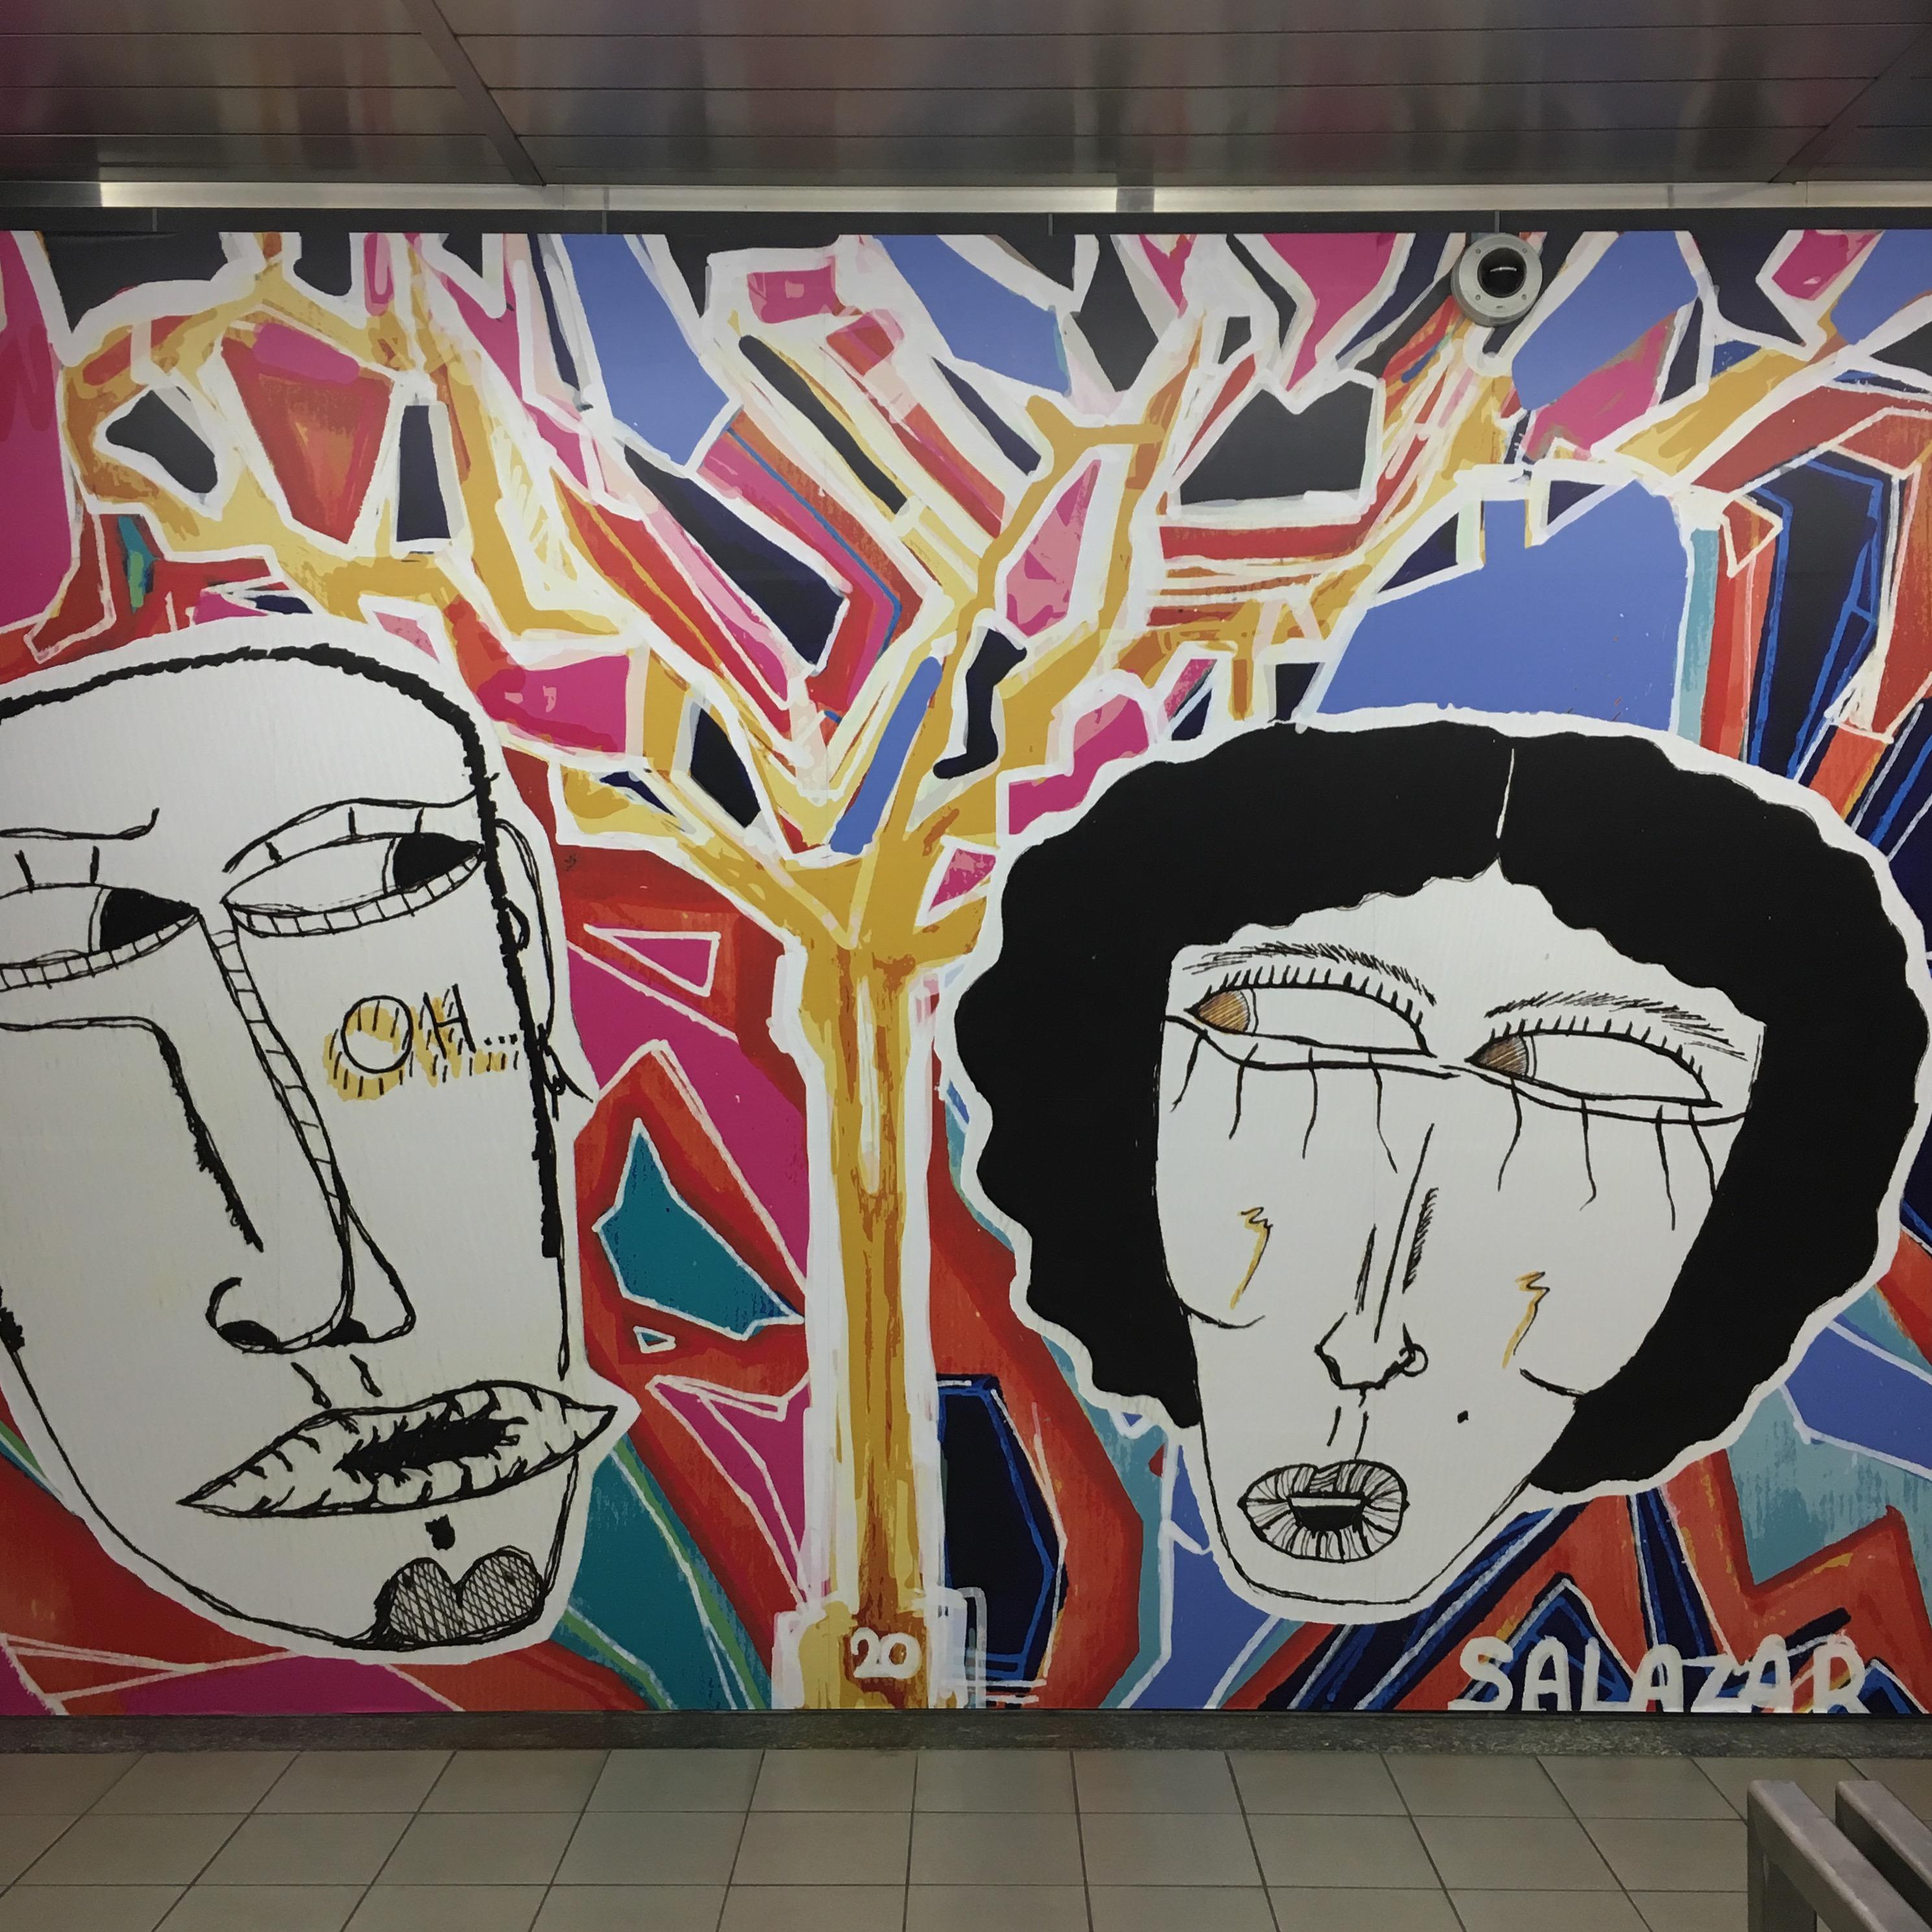 #entramie Salazar Collectif - 'Une rencontre éblouissante' / Frederik S. - graphic design - Gare du Midi uitgang richting bovengrondse trams